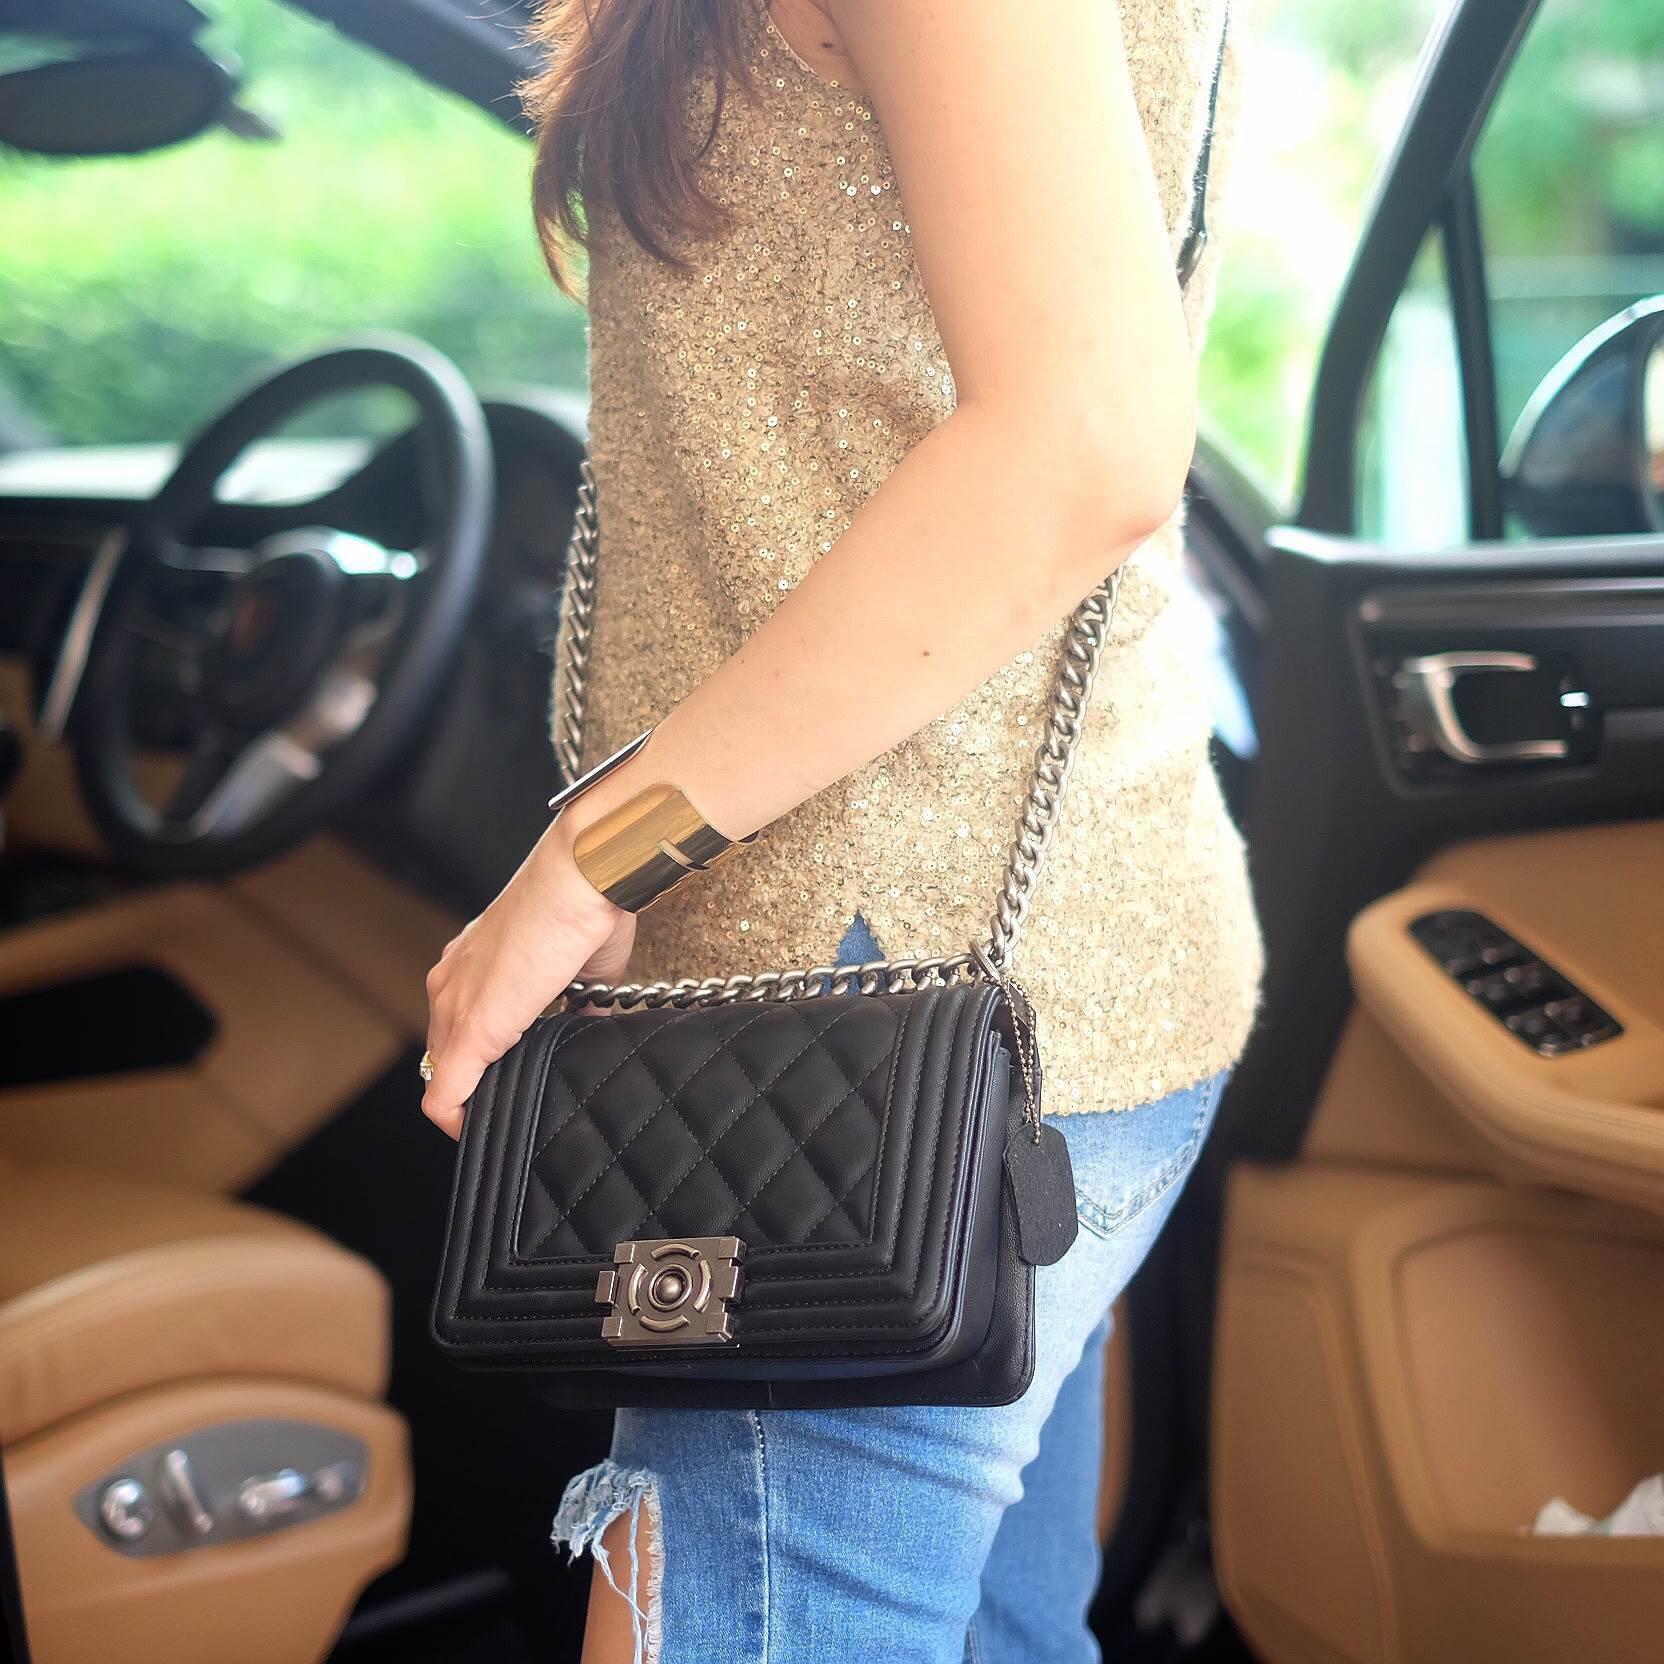 "KEEP mini 8"" shoulder Luxury Quited bag #เซเลบสุดๆจัดเลยค่าเหมาะมาก #Devaชอบใช้"